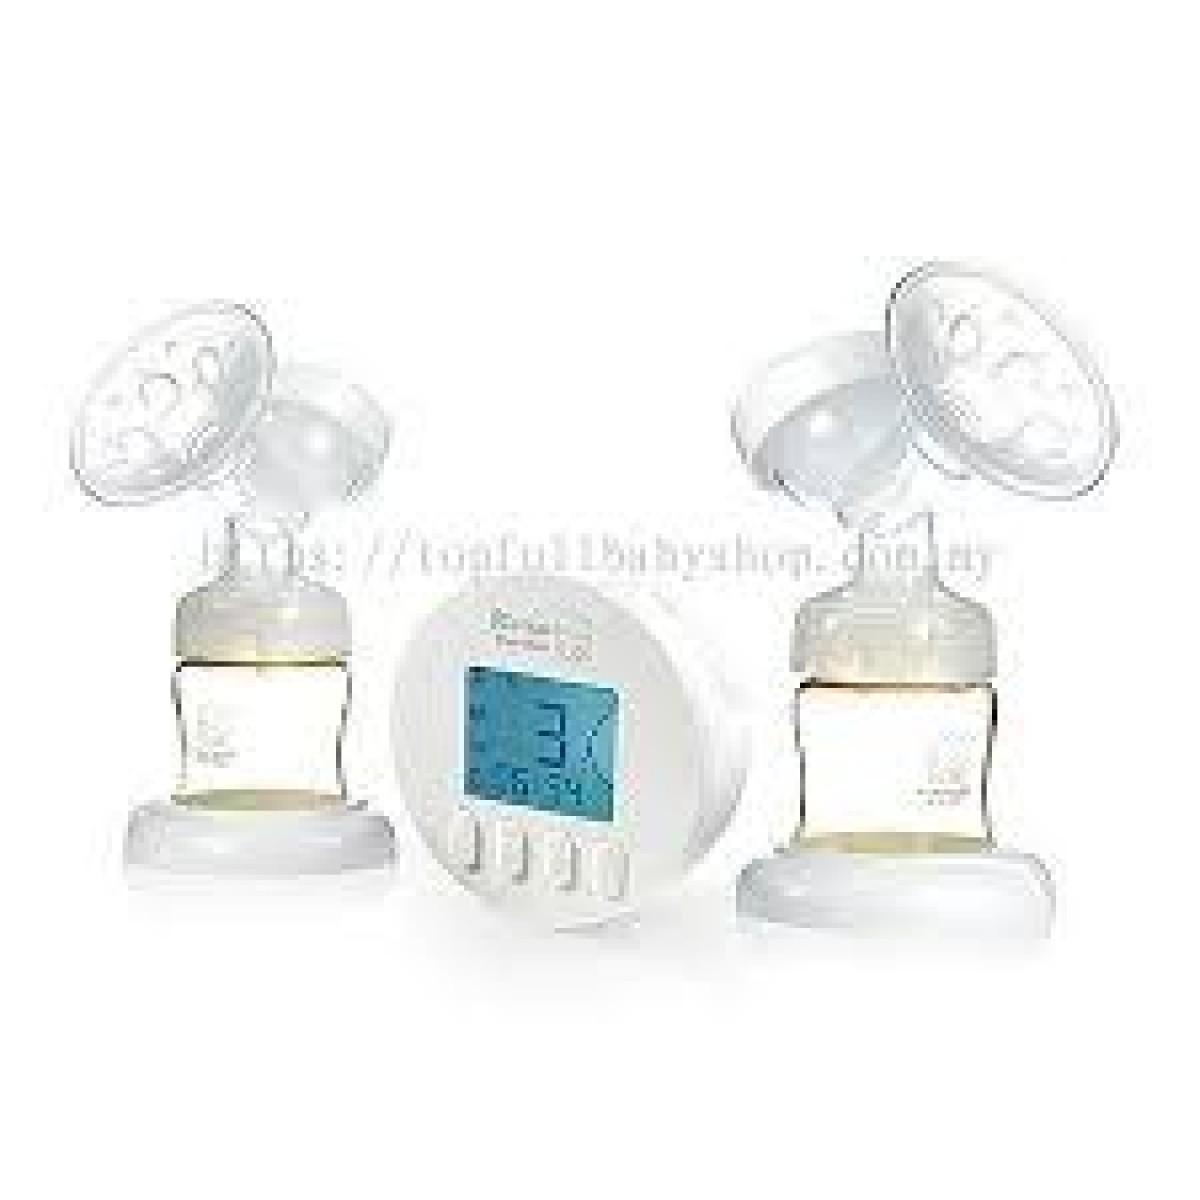 Kuku Duckbill Smart Electric Double Breast Pump - Kico Baby Center